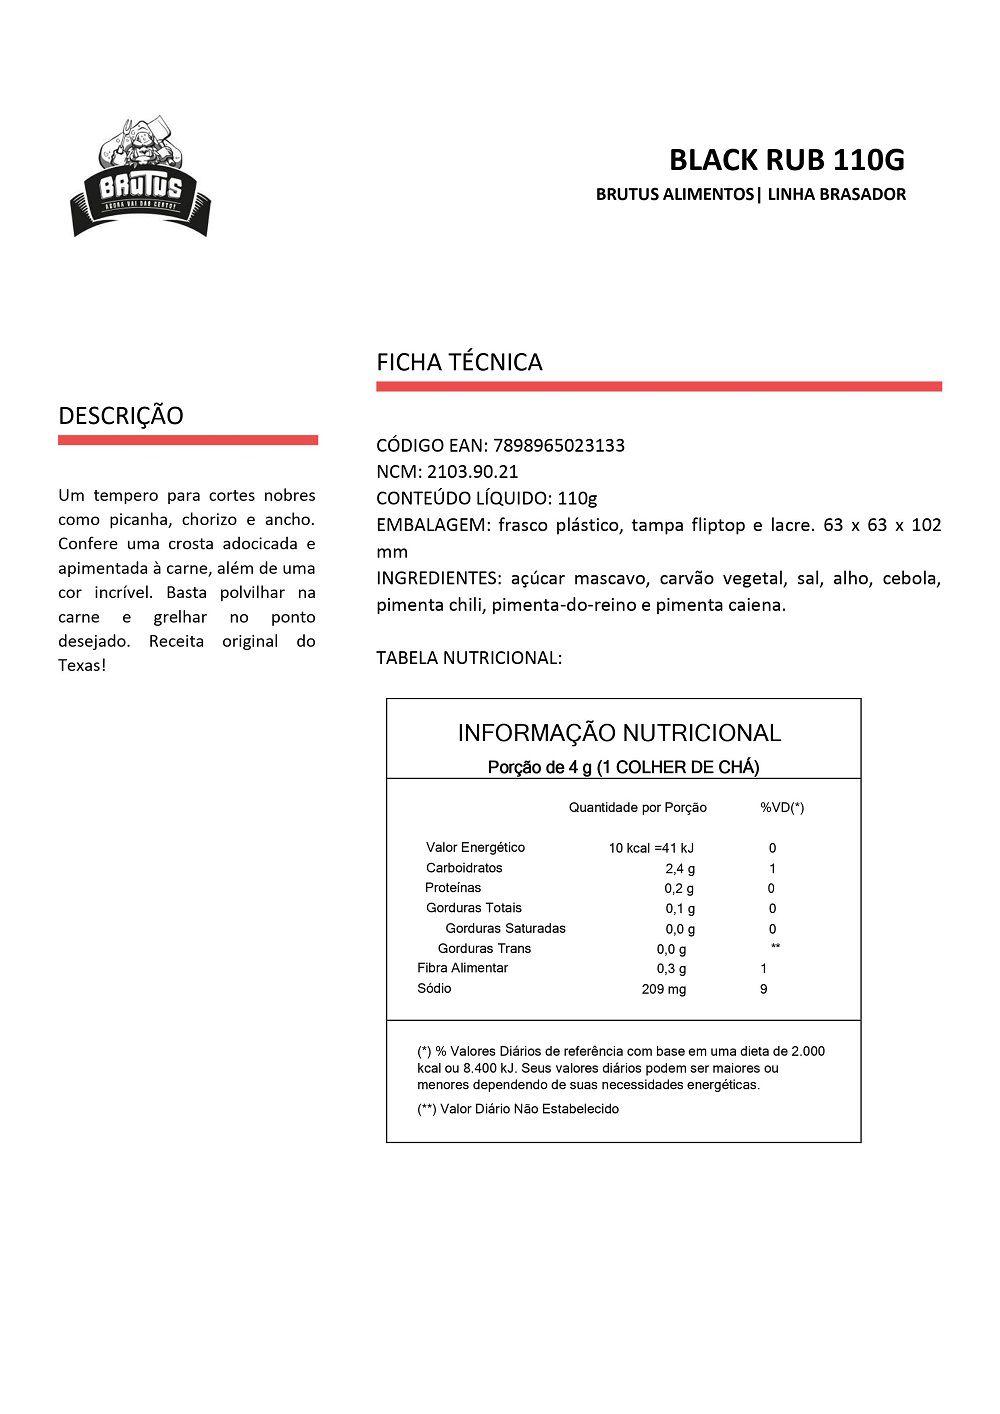 Black Rub Tempero para Bovinos Brutus 110g 06 unidades